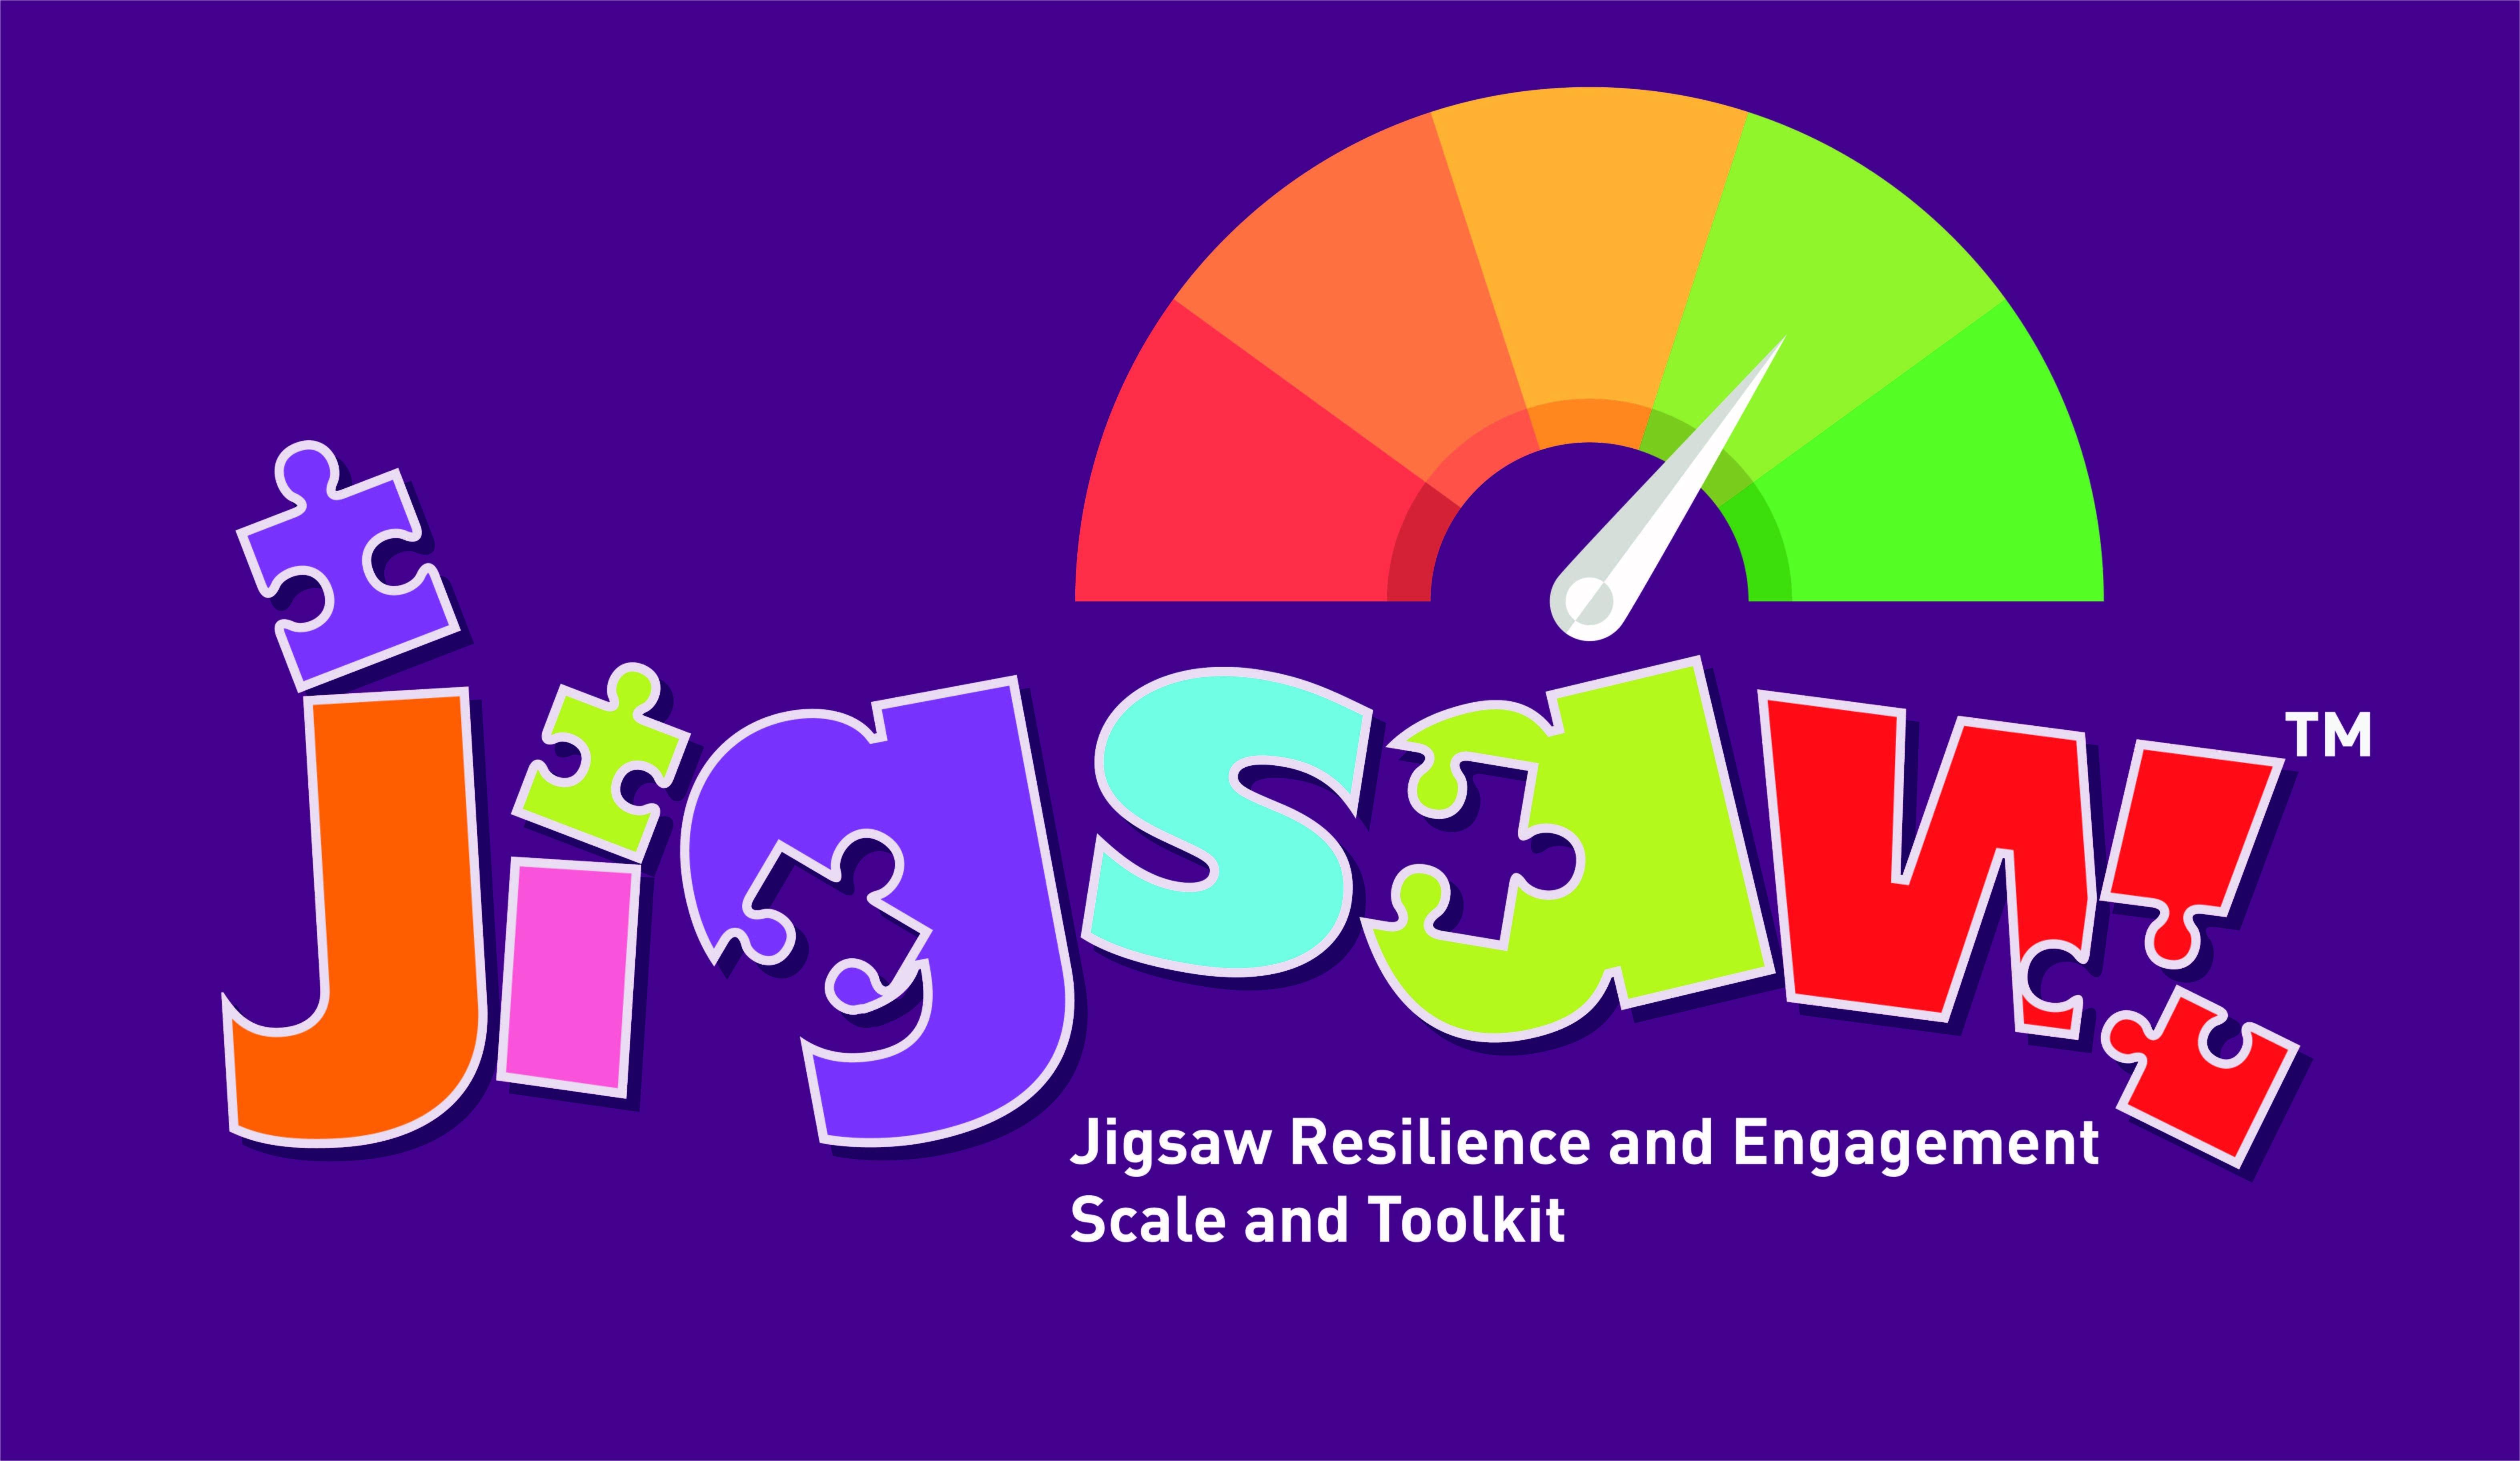 Jigsaw R.E.S.T. logo